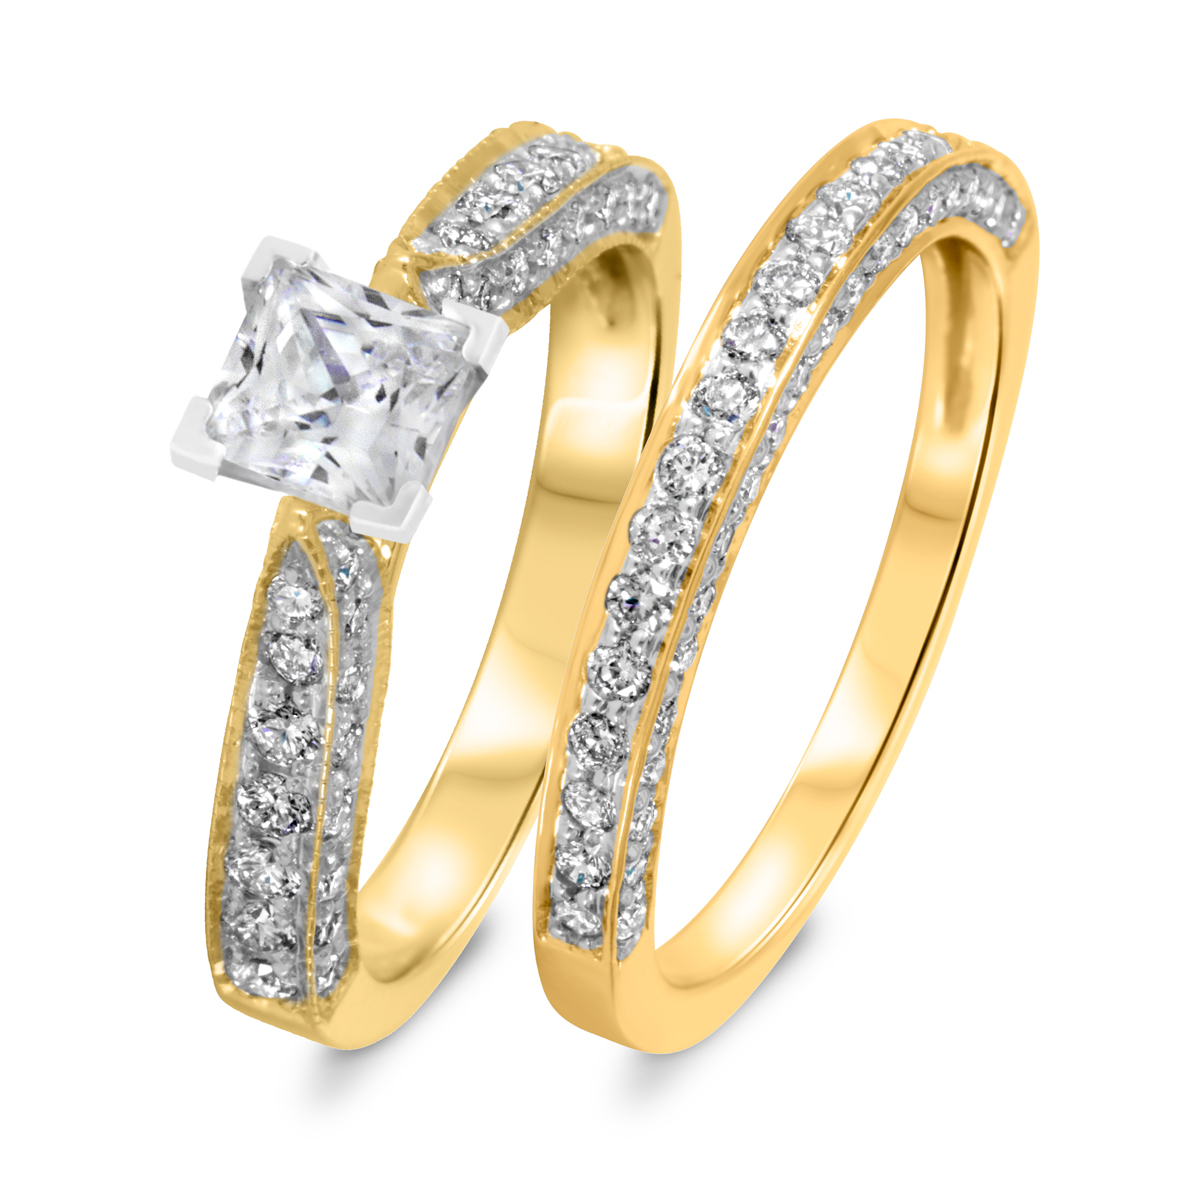 1 2/3 CT. T.W. Diamond Women's Bridal Wedding Ring Set 10K Yellow Gold